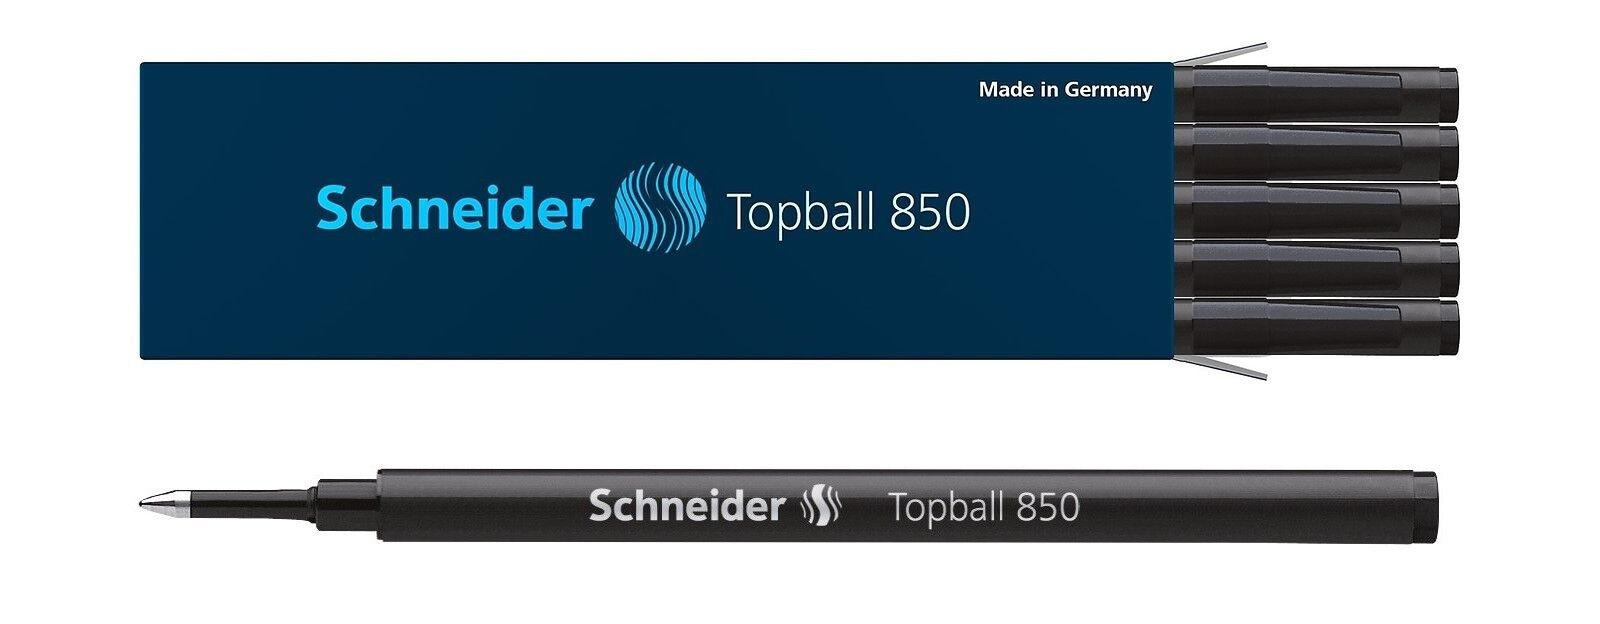 10 – Schneider Topball 850 Rollerball Pen Refills, .5mm, Black Ink, German Made Collectibles